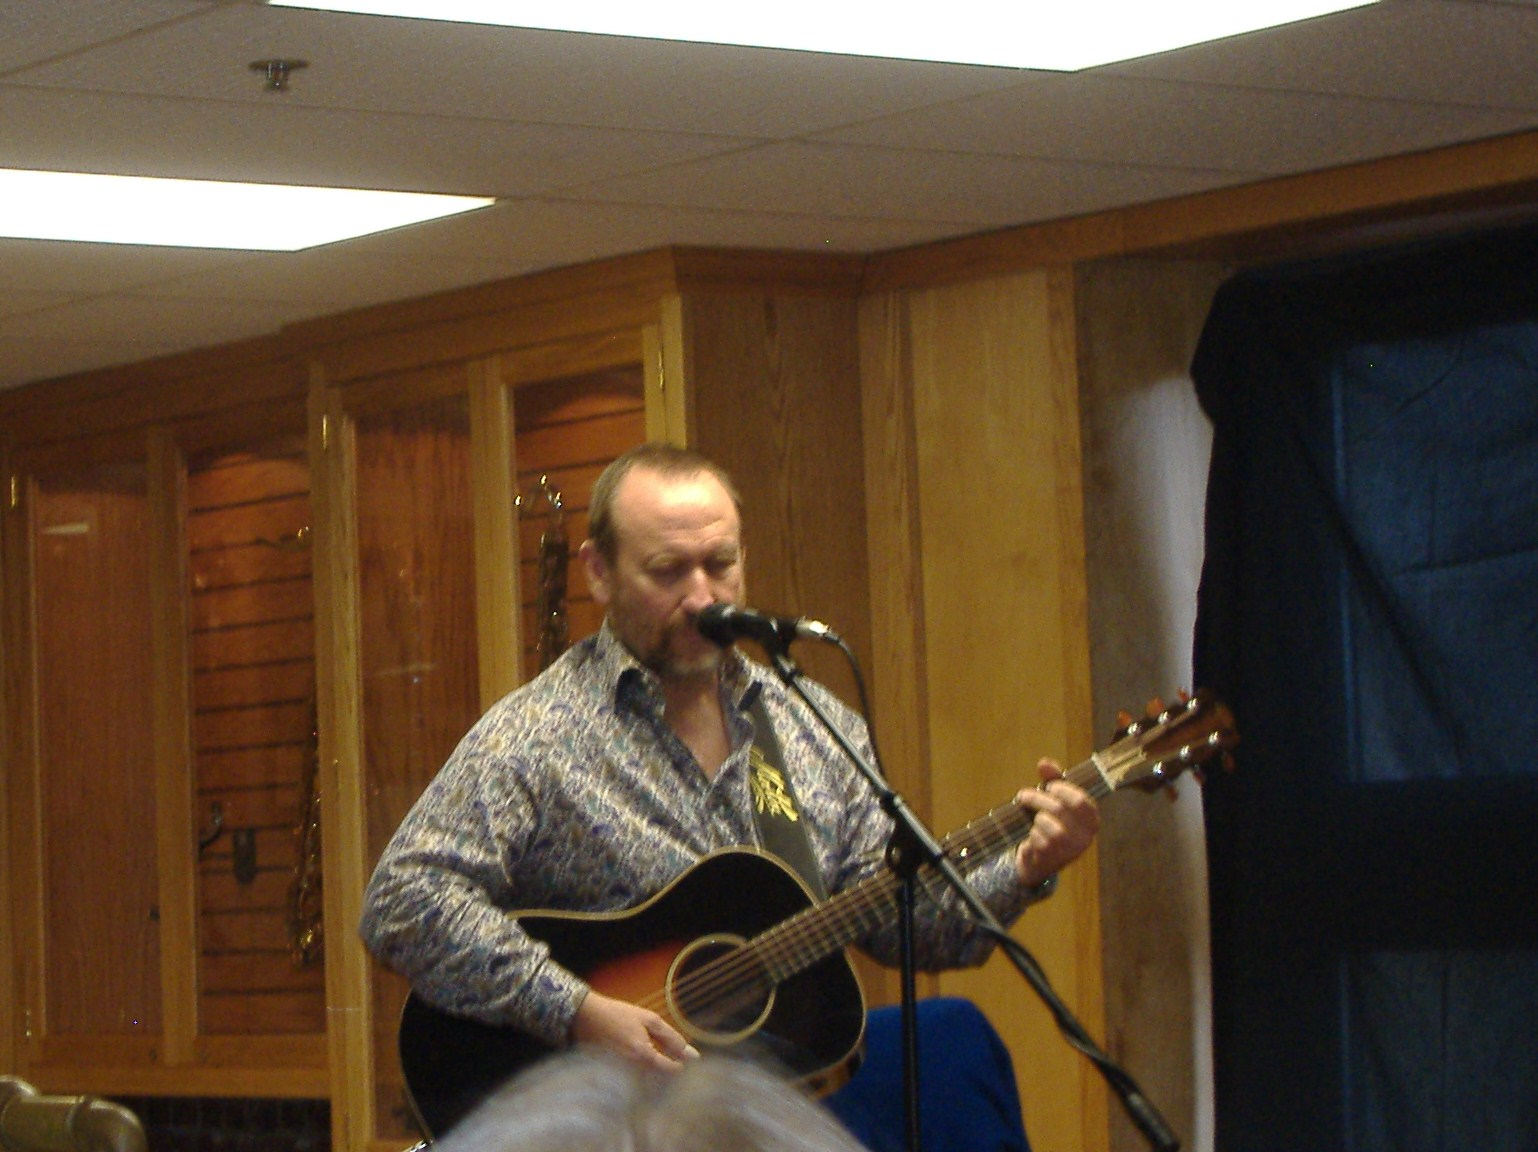 CasaCoisalinda: Colin Hay-Jack's Music Shoppe Red Bank, NJ 4/16/11